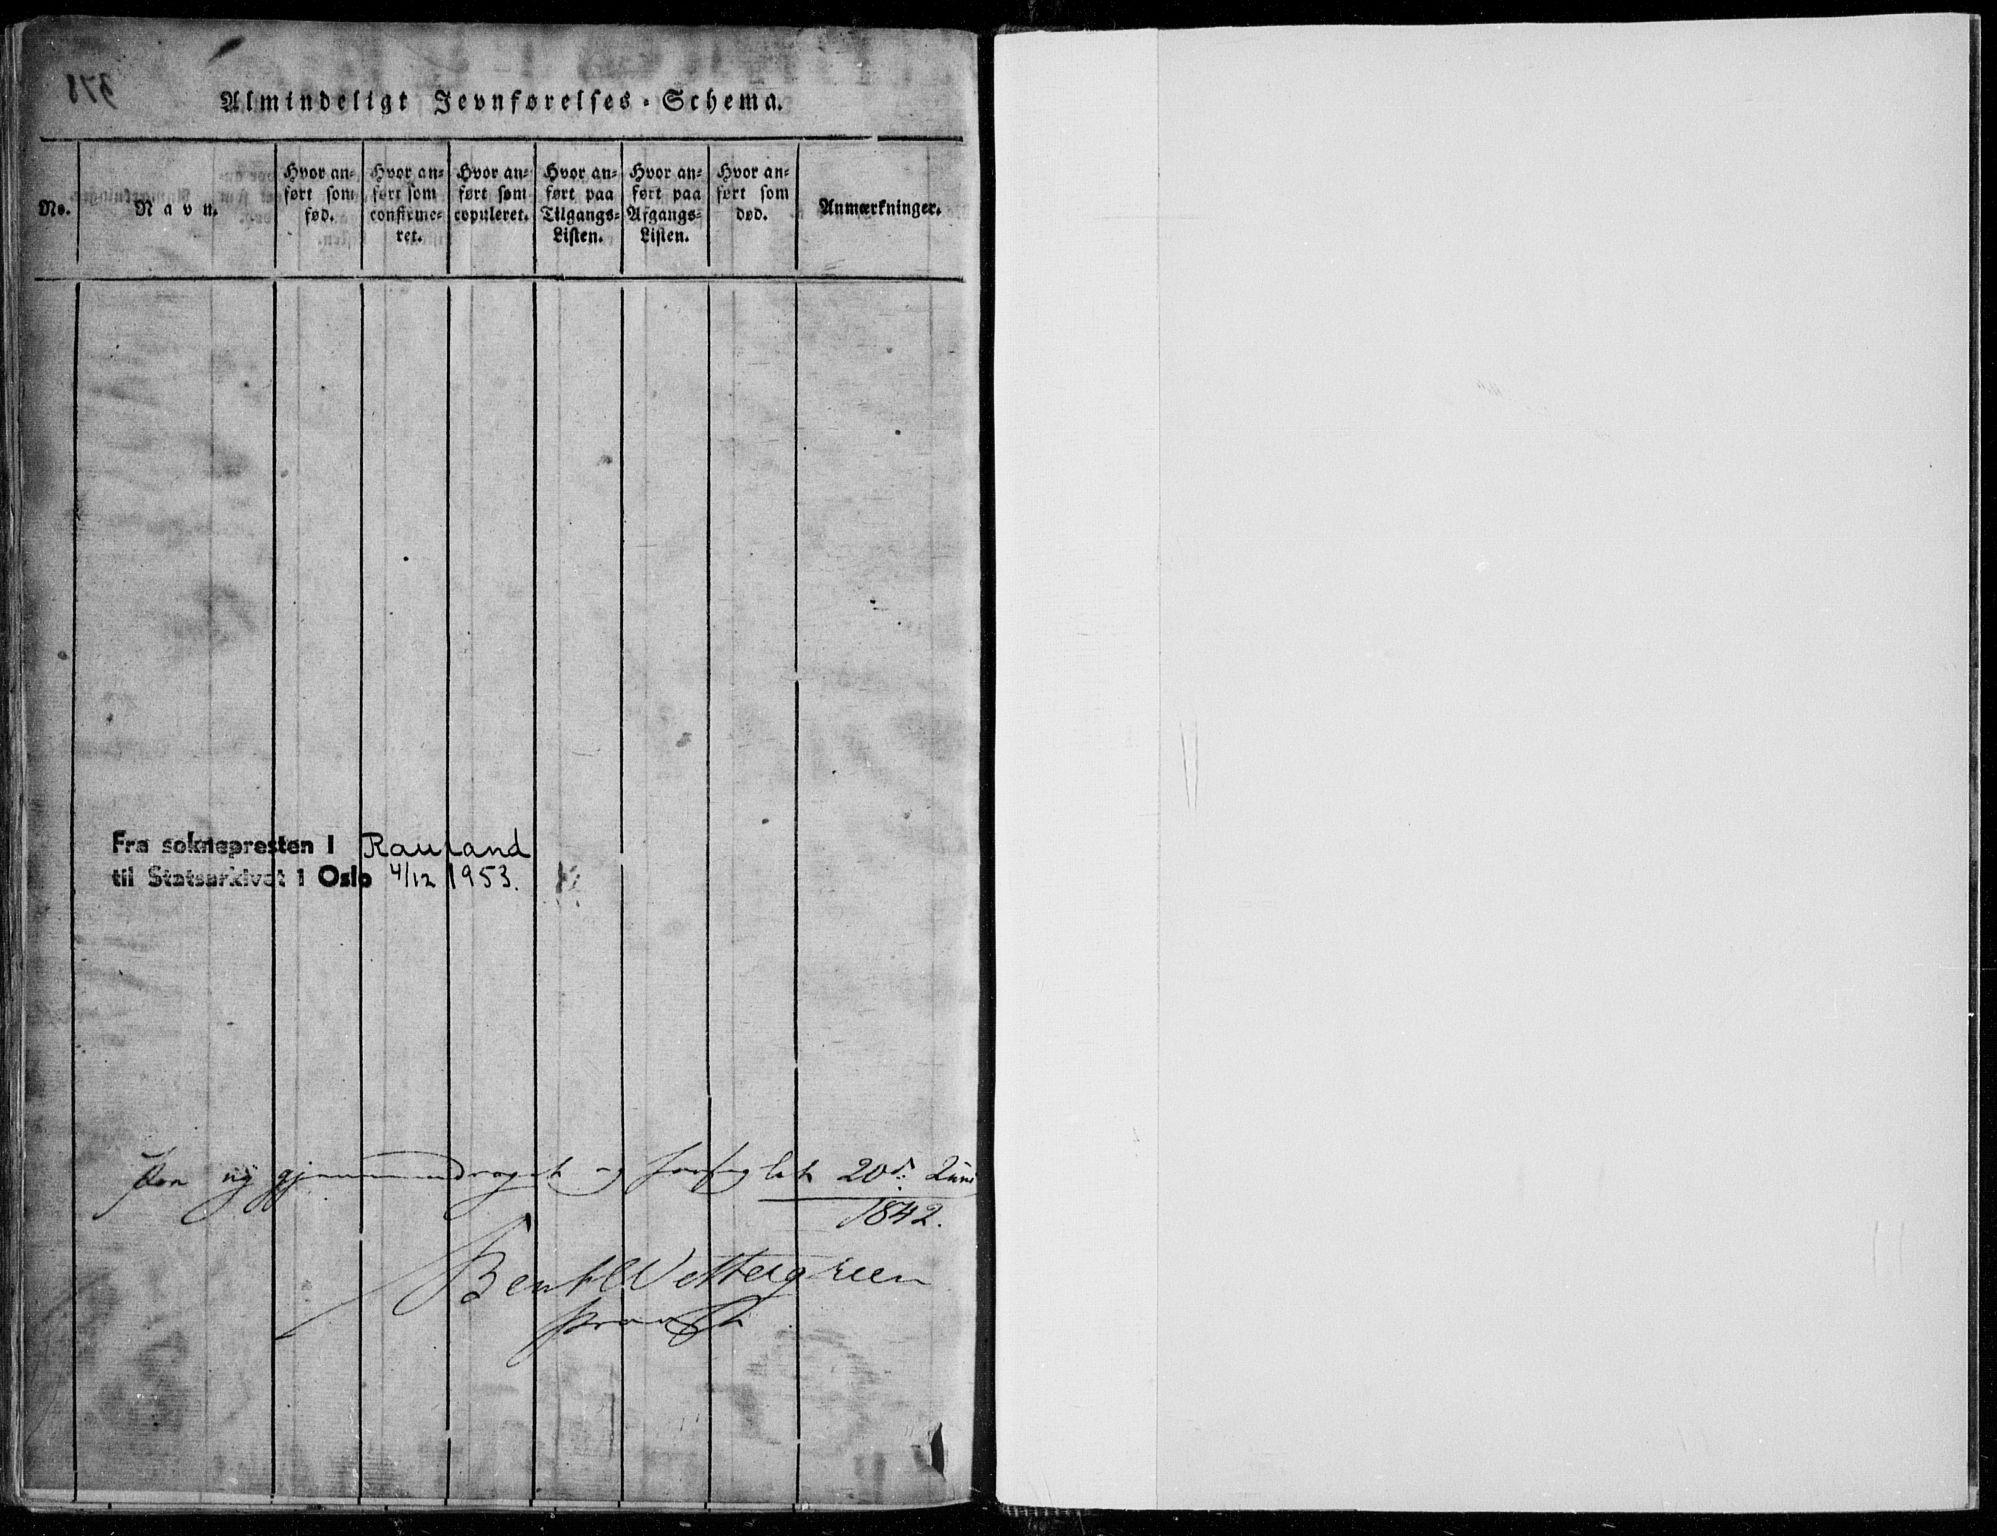 SAKO, Rauland kirkebøker, F/Fa/L0001: Ministerialbok nr. 1, 1814-1859